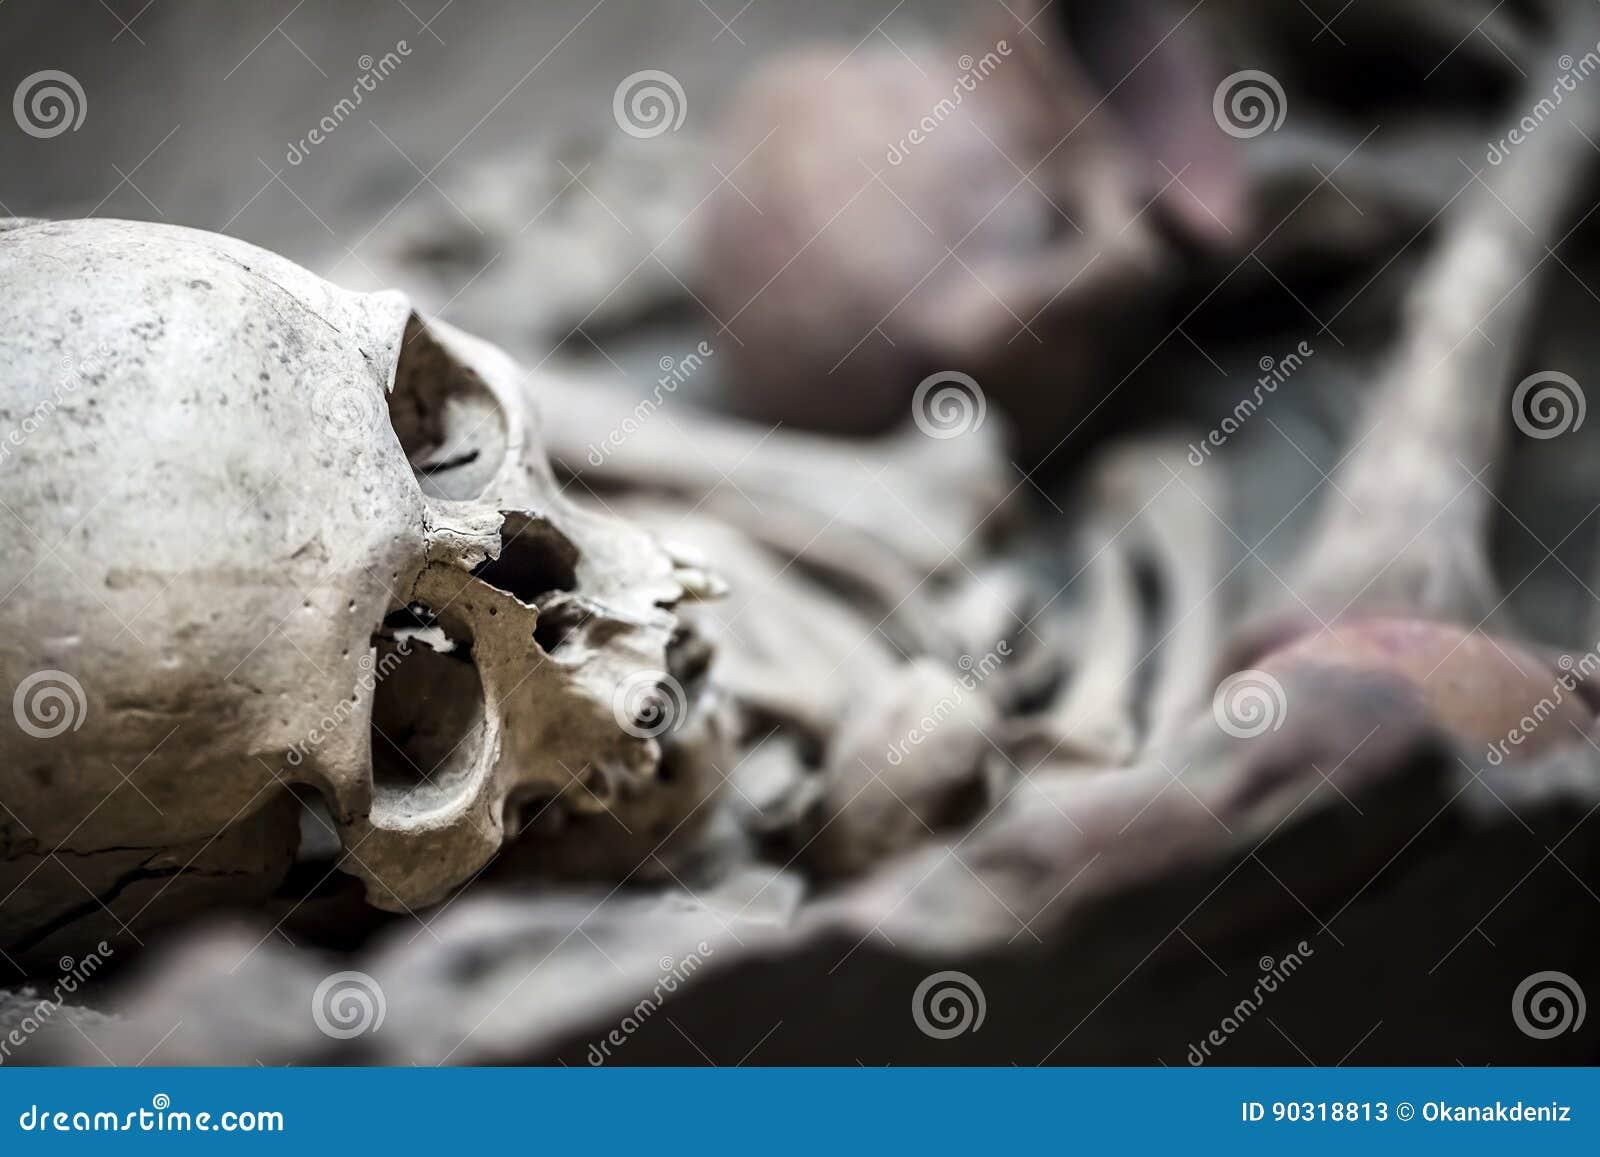 Skeleton Dead Body Head stock image. Image of crime, anatomy - 90318813